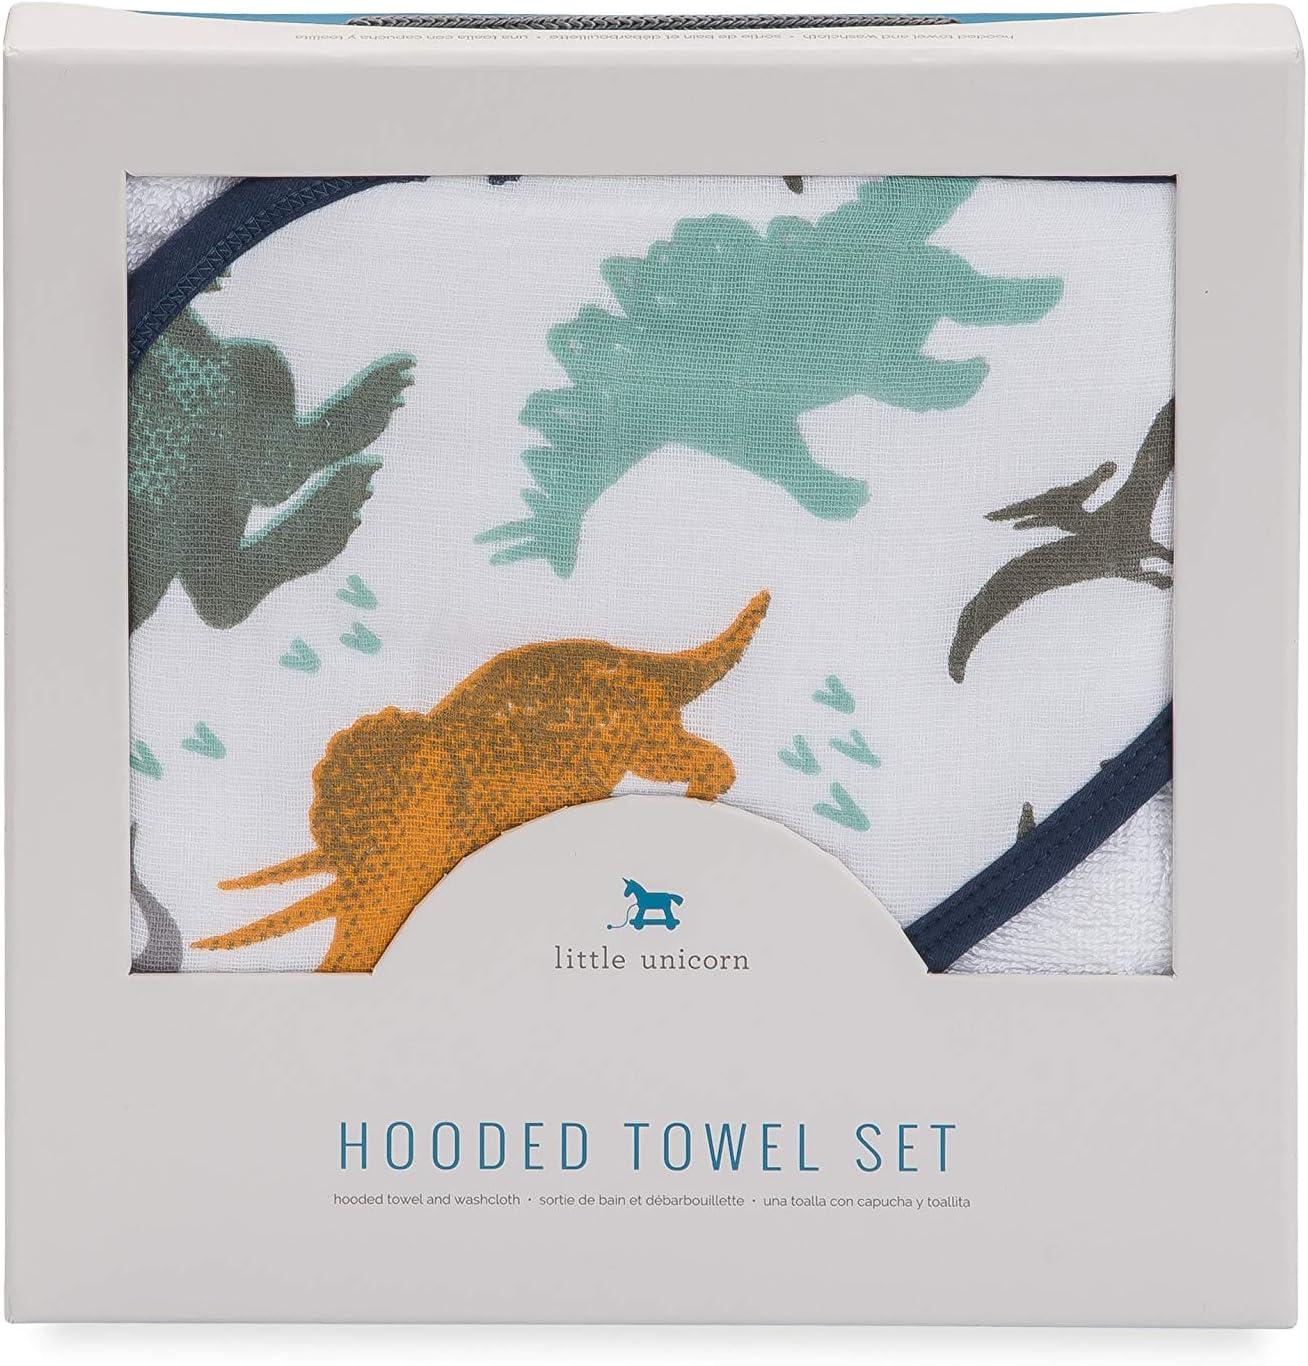 Navy Blue Little Unicorn Cotton Hooded Towel /& Wash Cloth Set Green Dino Friends